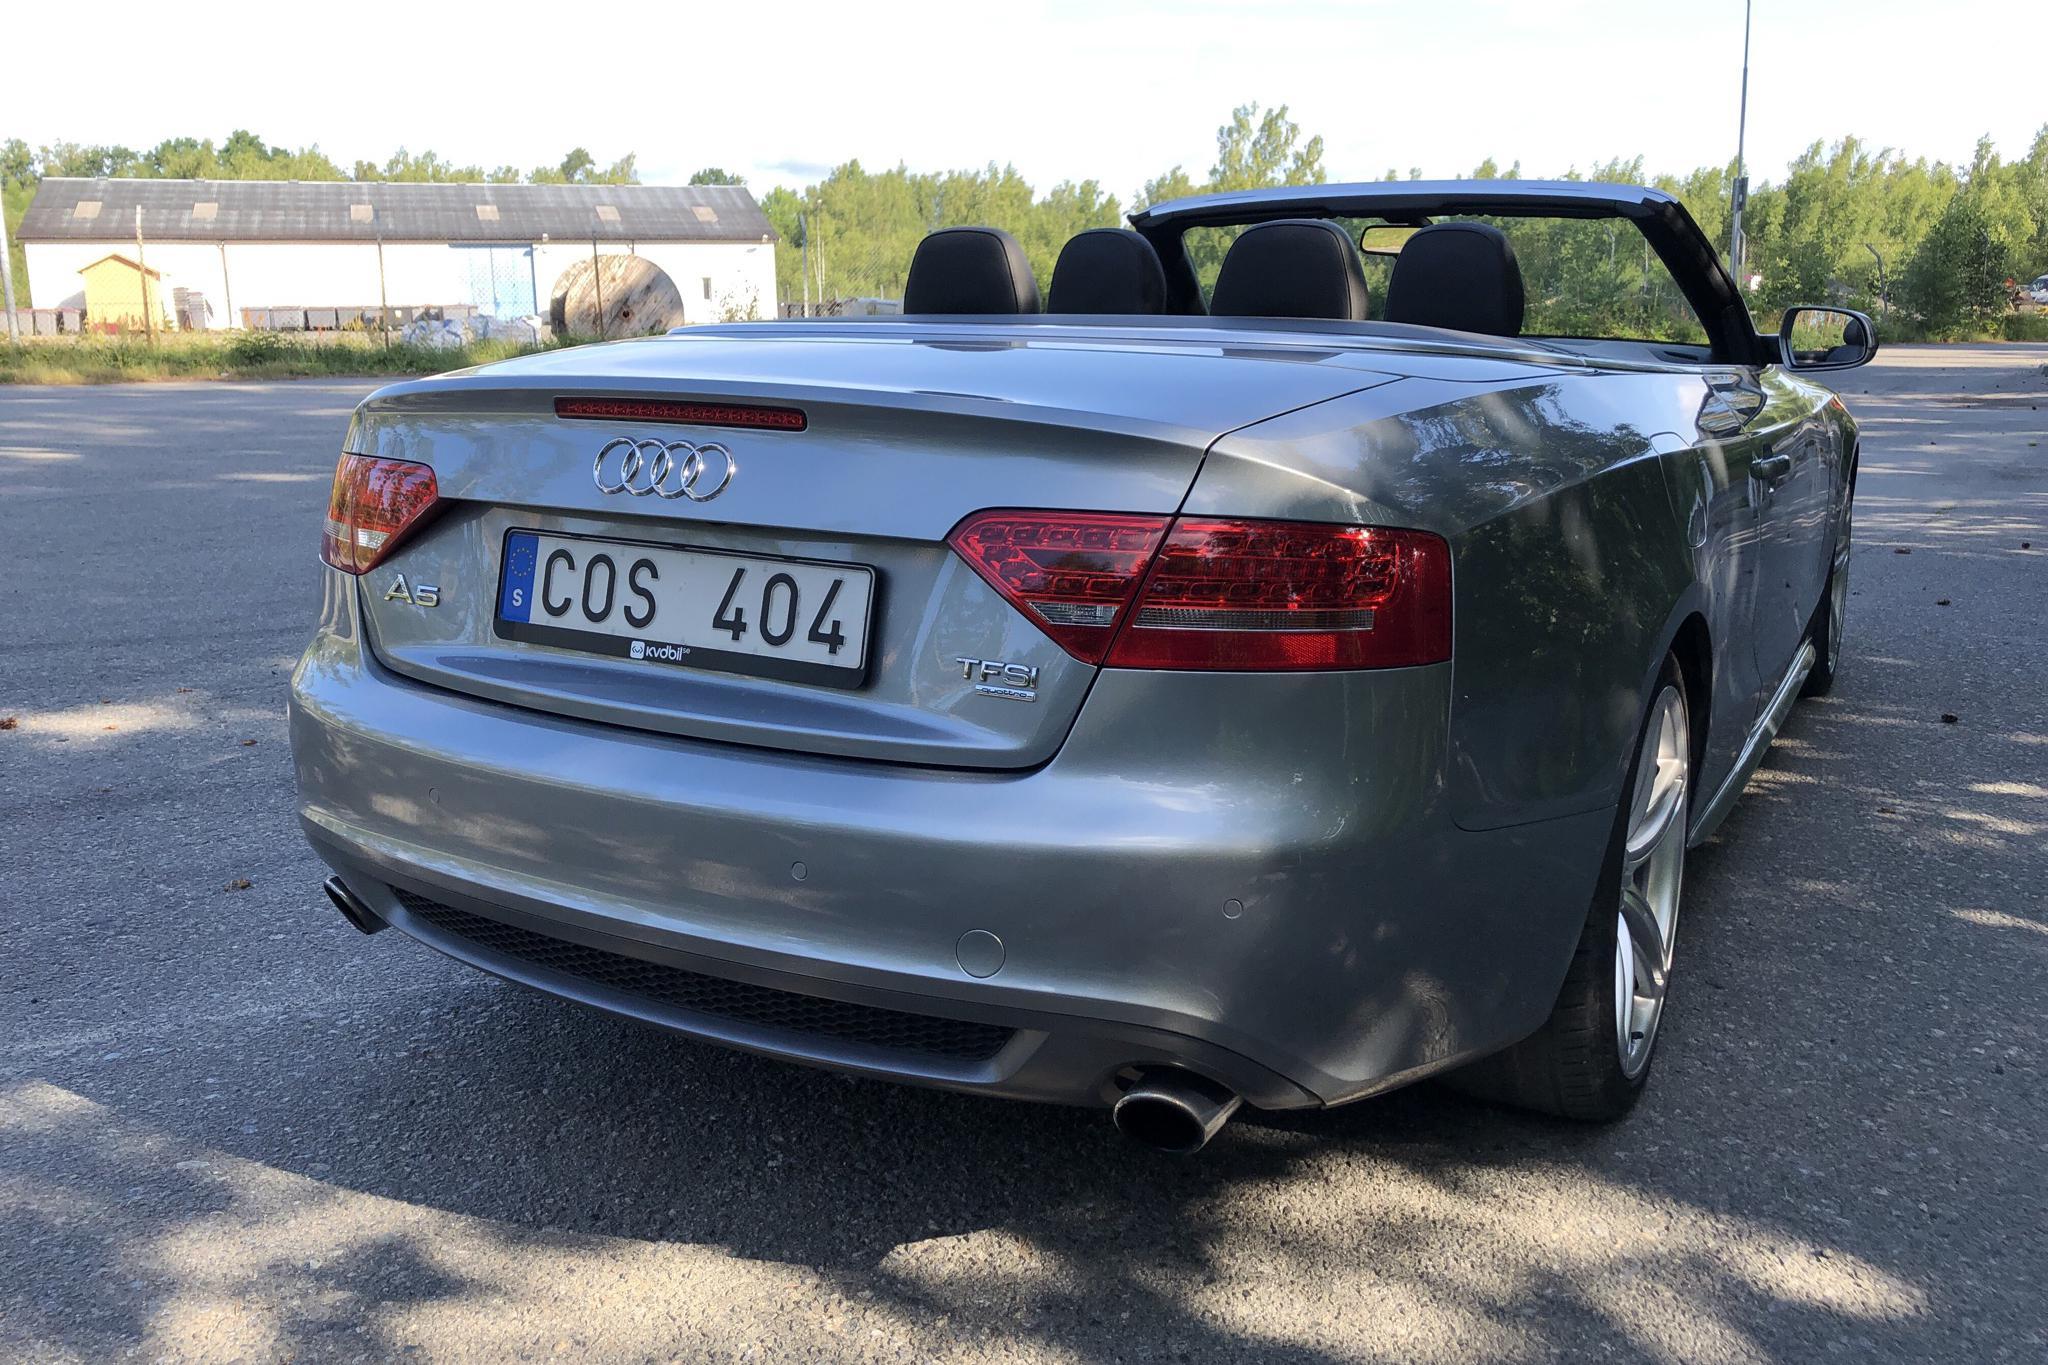 Audi A5 2.0 TFSI Cabriolet quattro (211hk) - 88 270 km - Automatic - gray - 2011